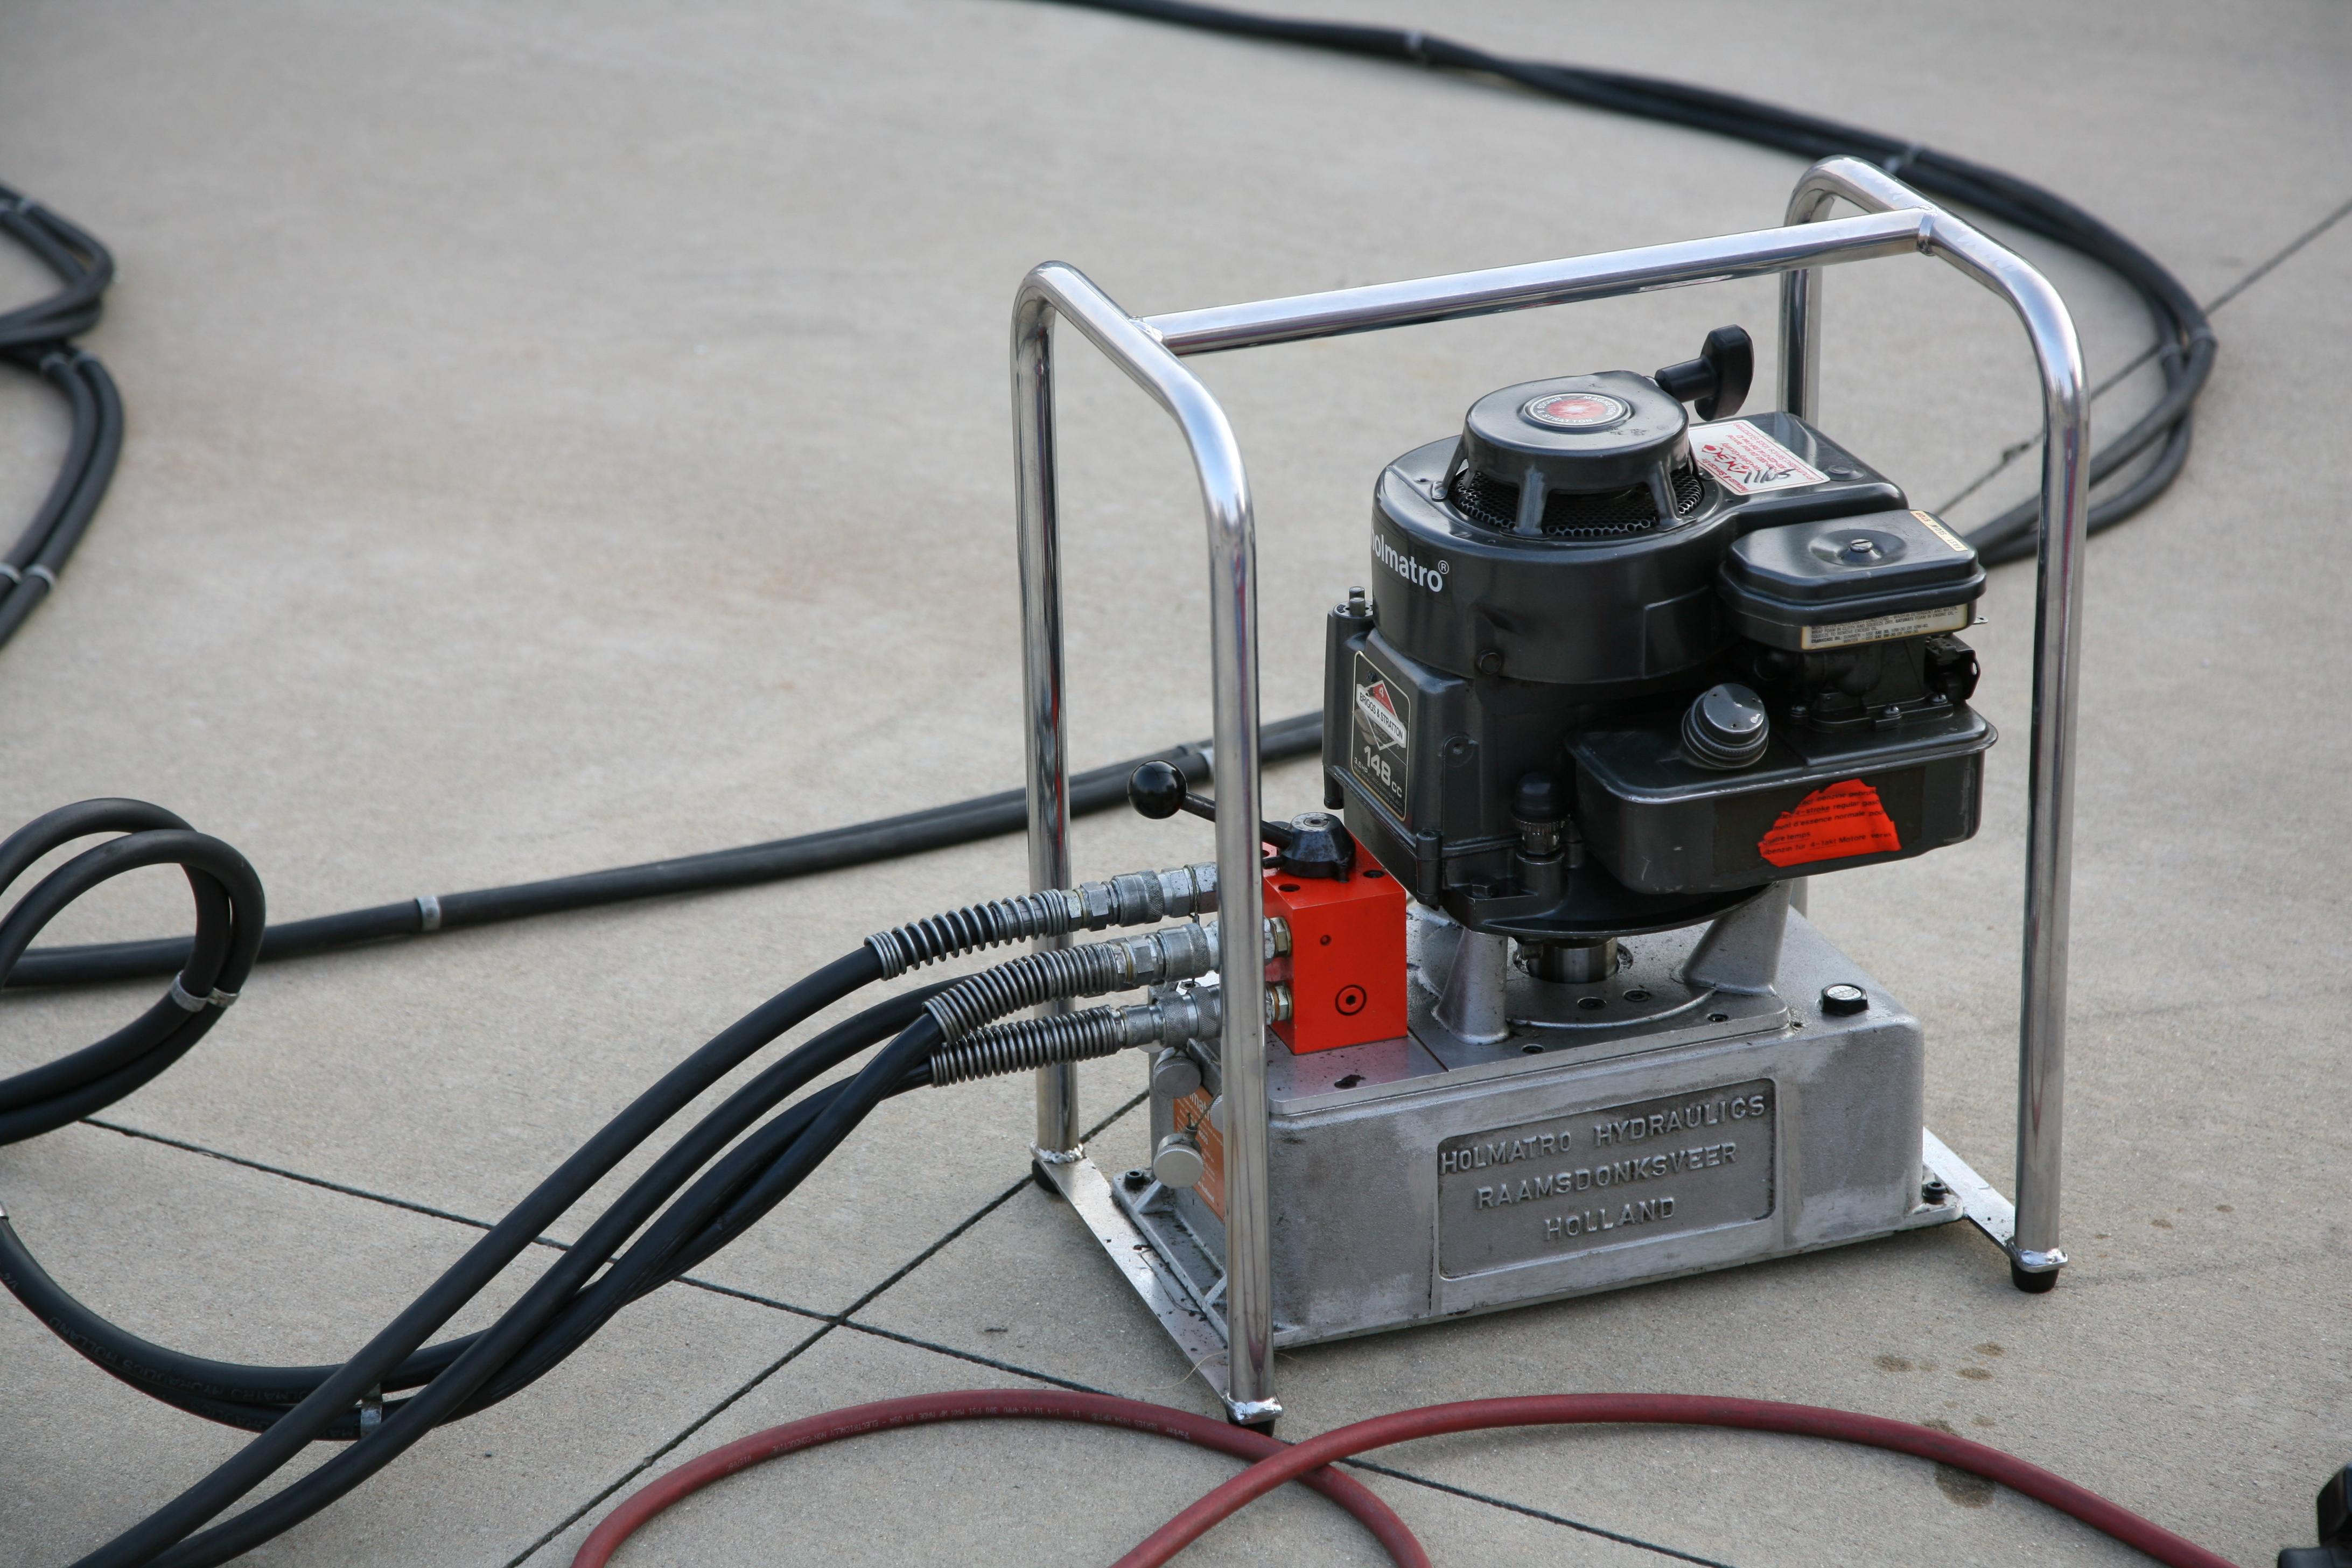 Hydraulic Diaphragm Metering Pumps Market in 360MarketUpdates.com